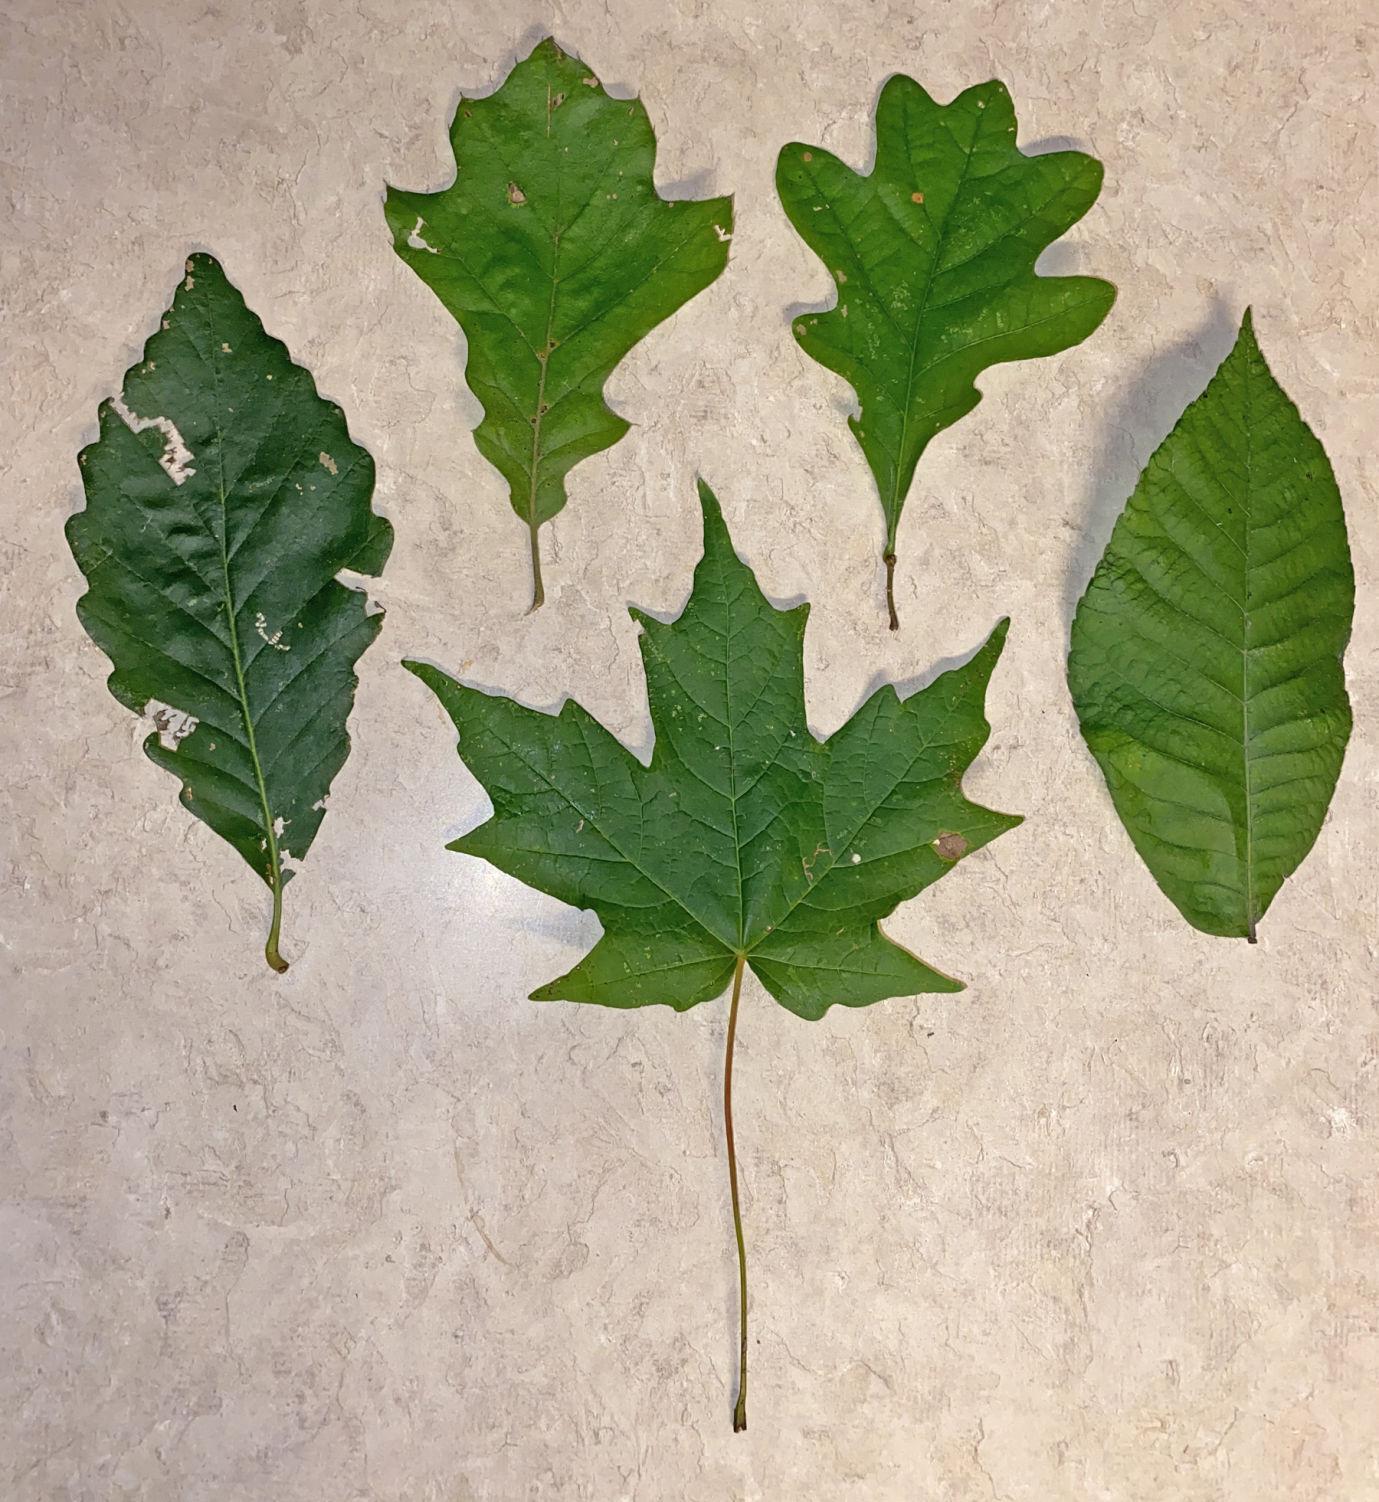 NN17 - Oak, maple and hickory leaves